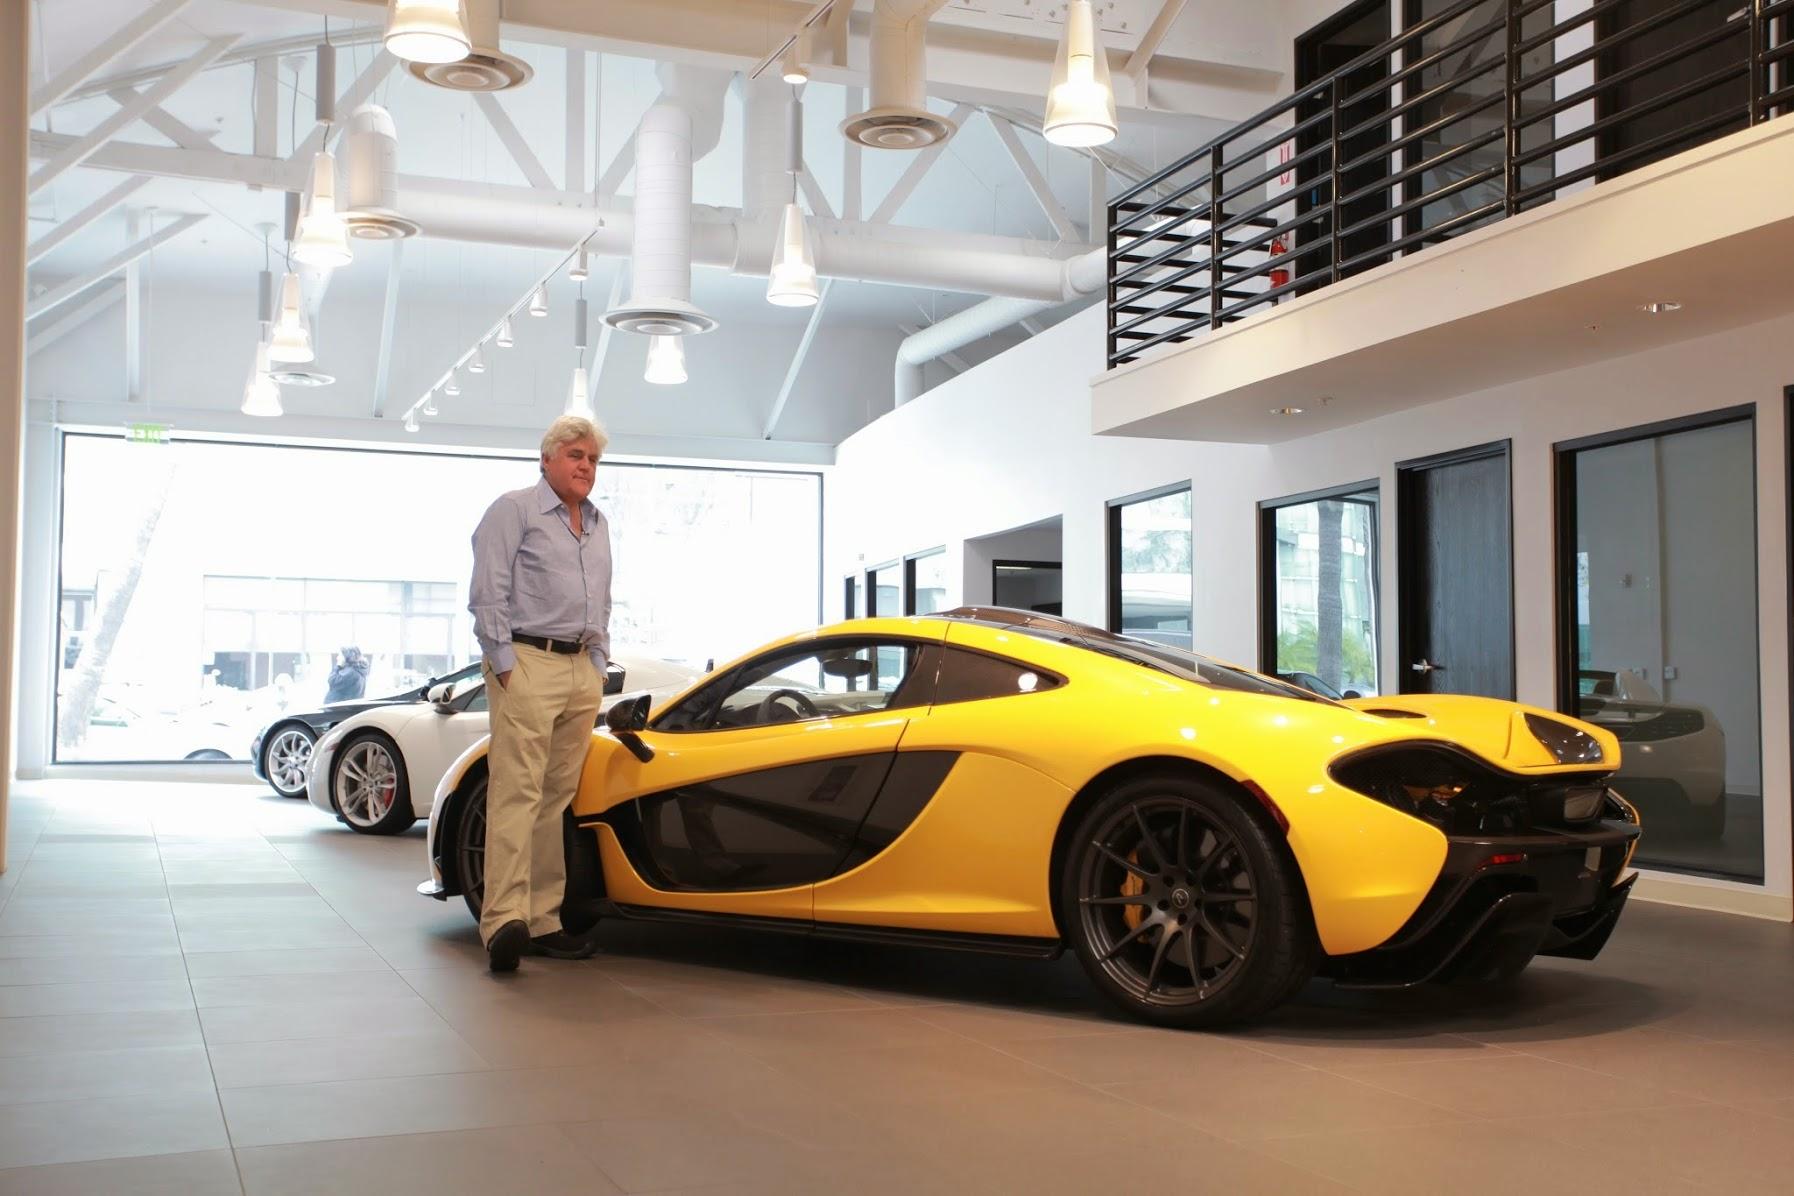 2018 Toyota 4Runner Spy Photos >> Jay Leno Finally Takes His McLaren P1 For A Spin: Video